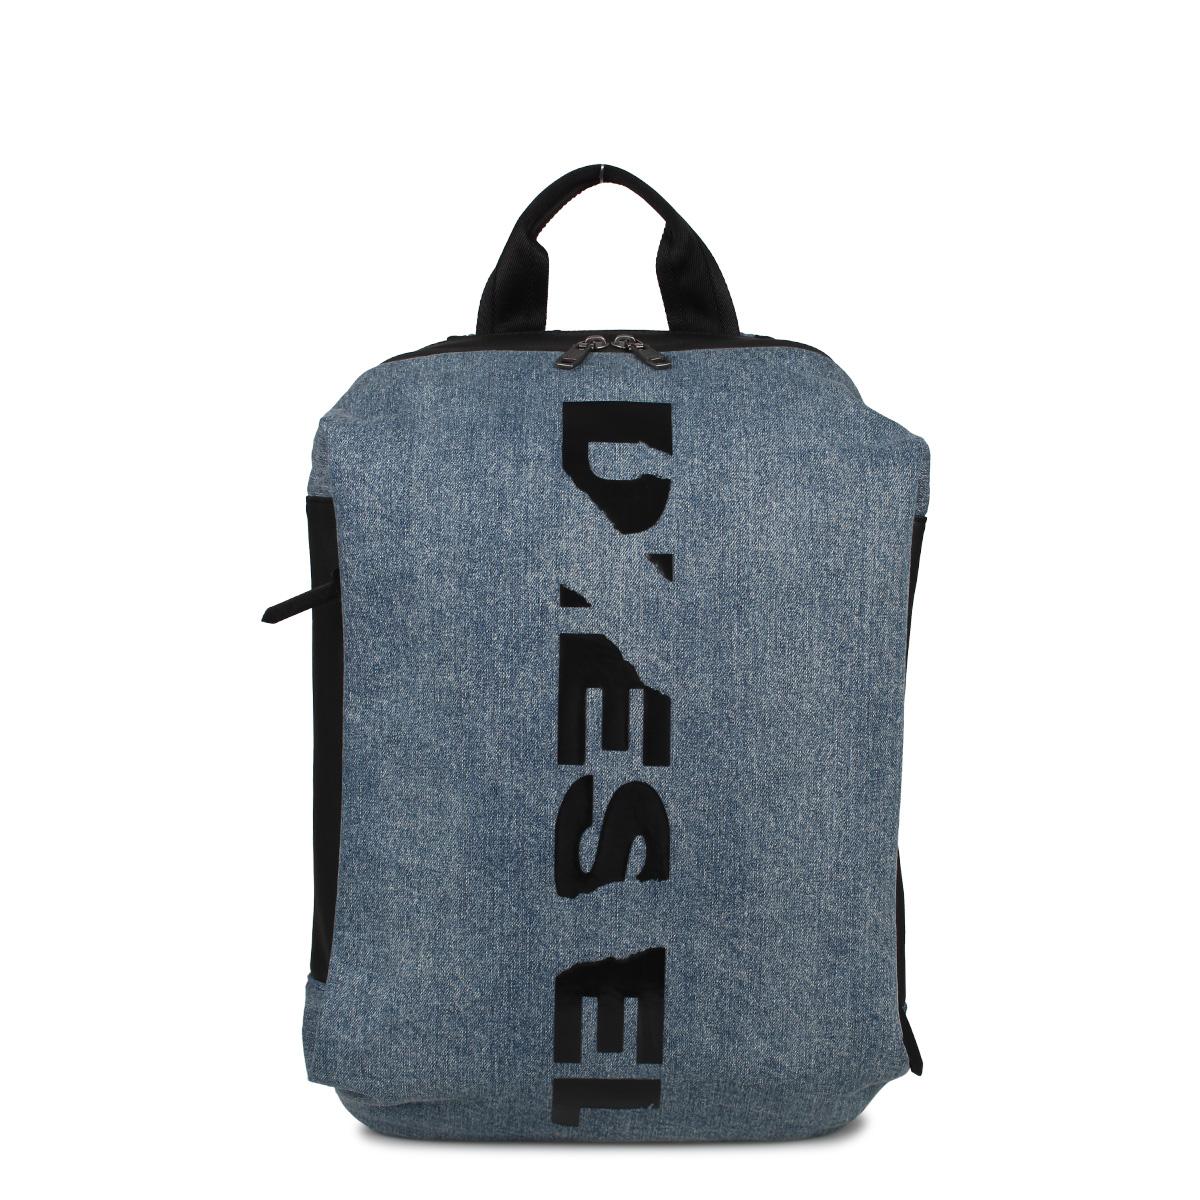 DIESEL D-SUBTORYAL BACKPACK ディーゼル リュック バッグ バックパック メンズ レディース ブルー X05783P1826 [4/20 新入荷]